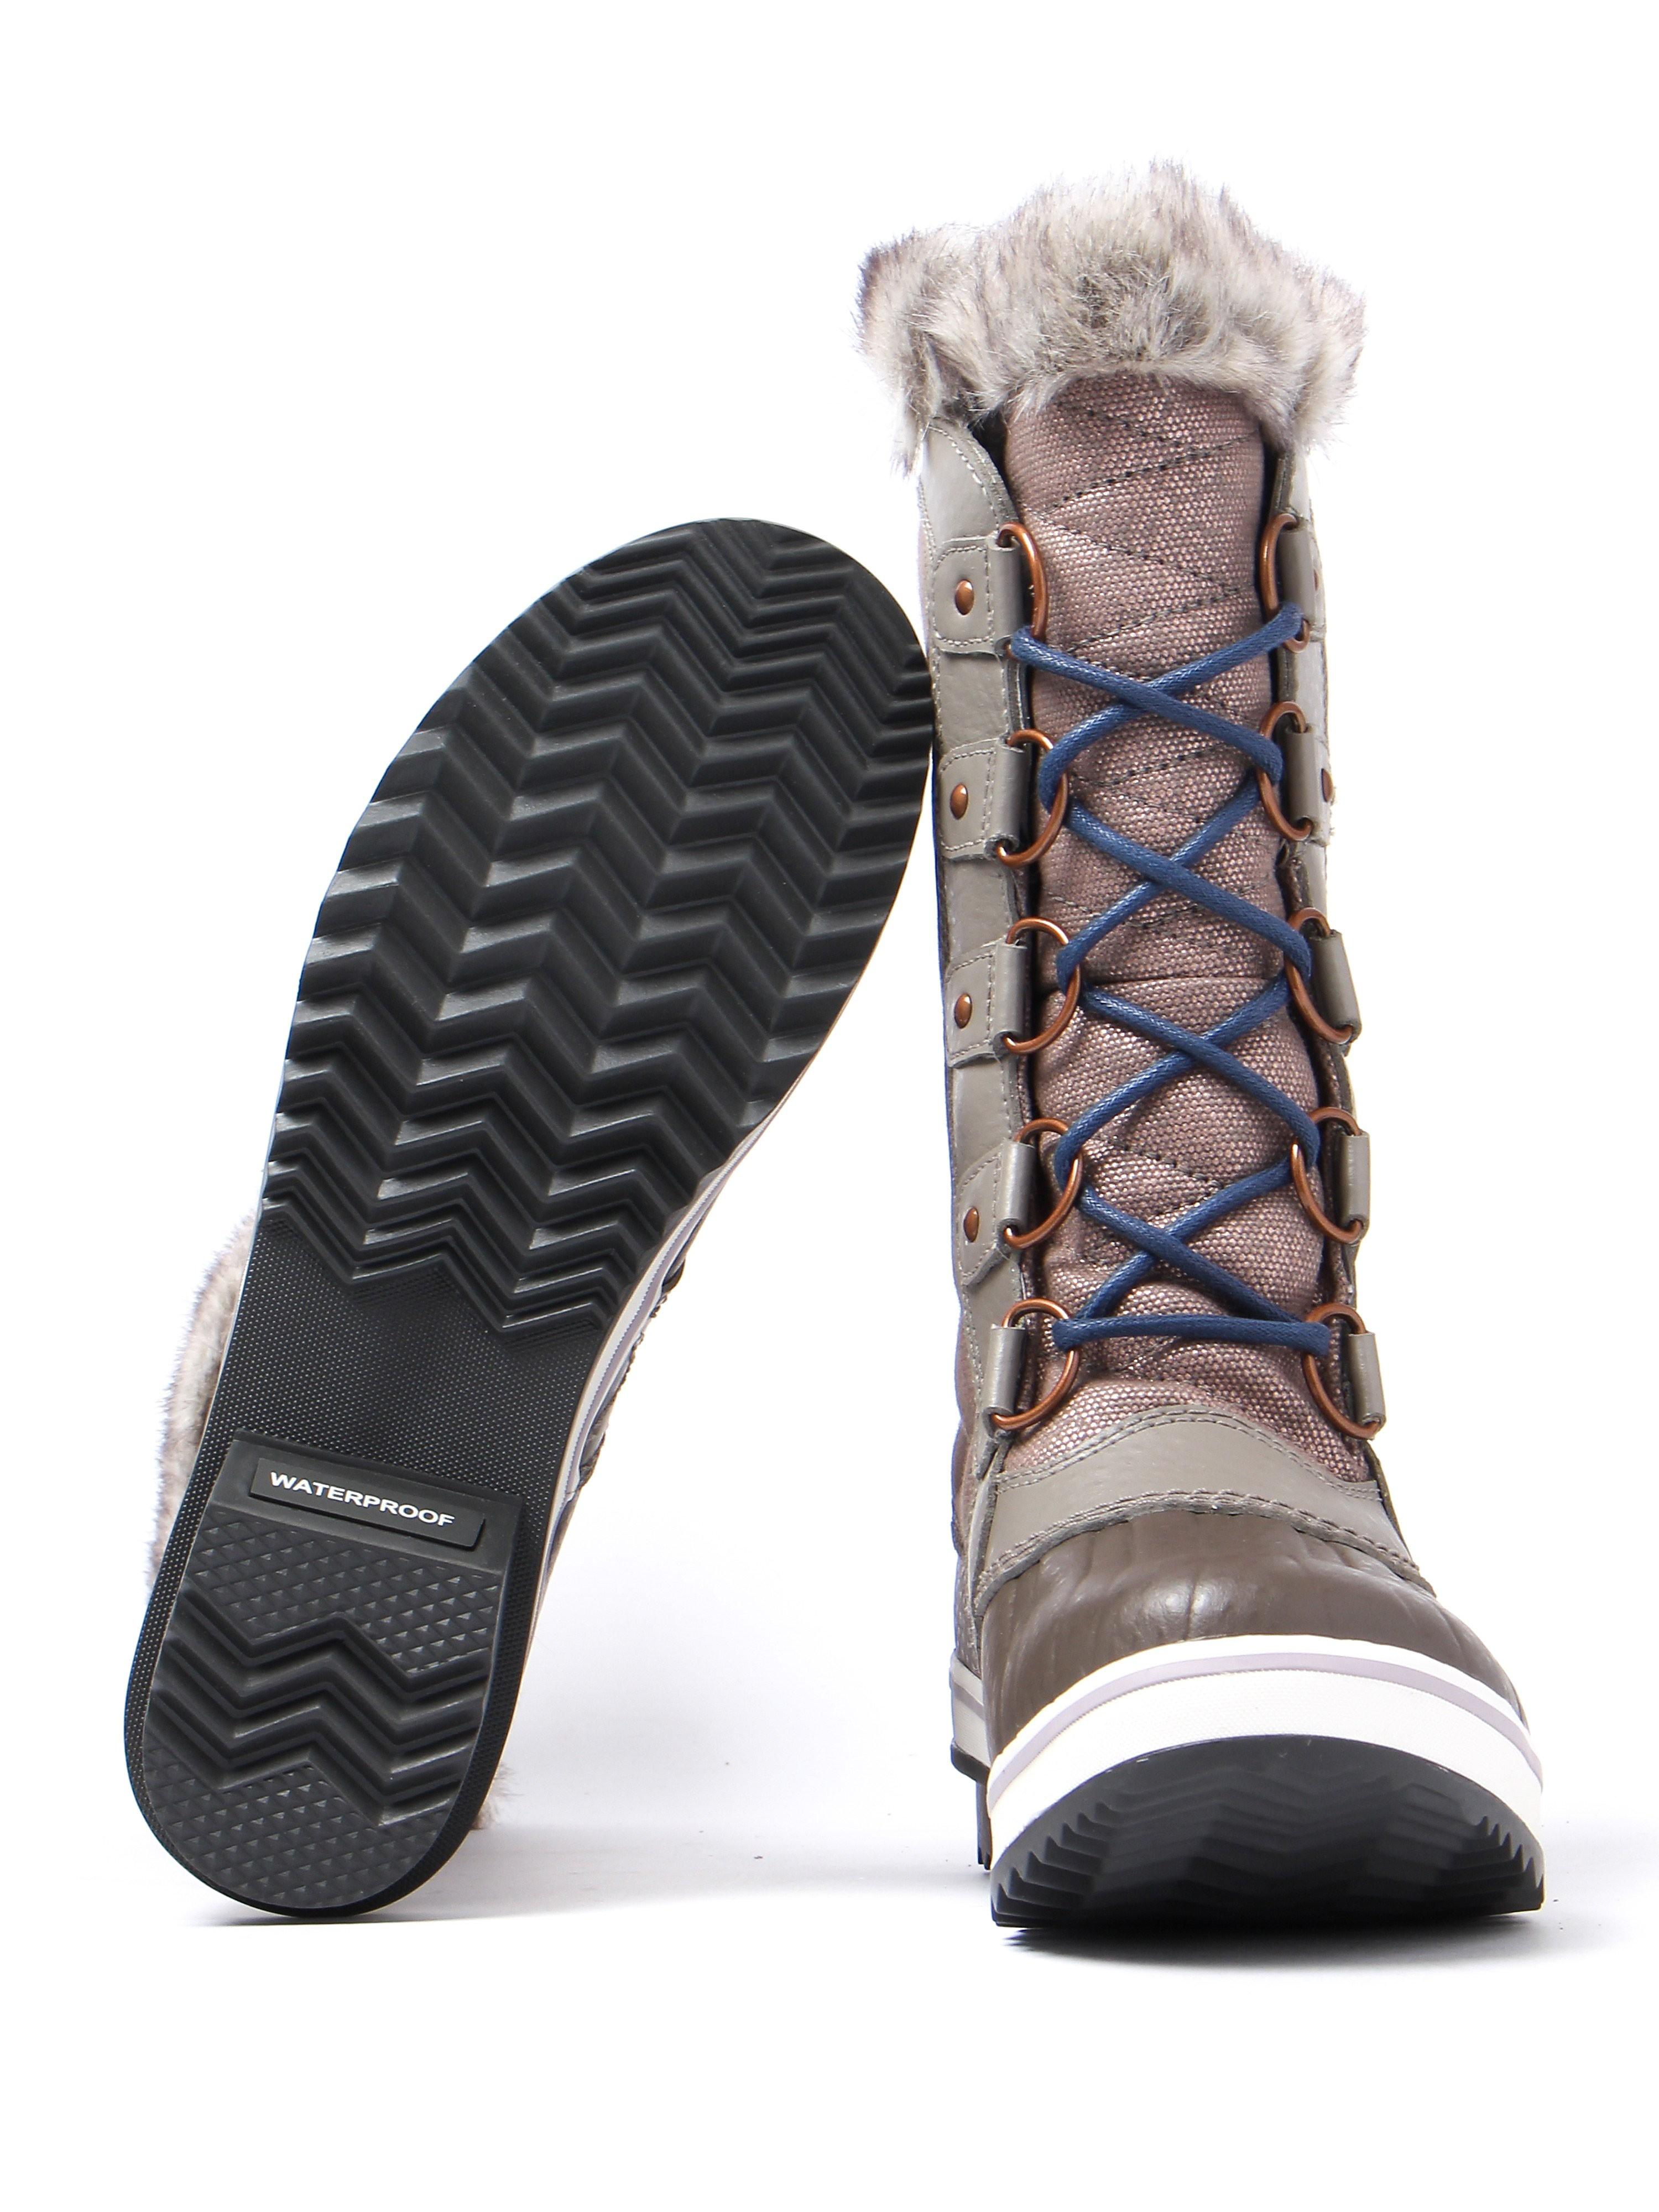 Sorel Women's Tofino II Tall Boots - Kettle Dusk